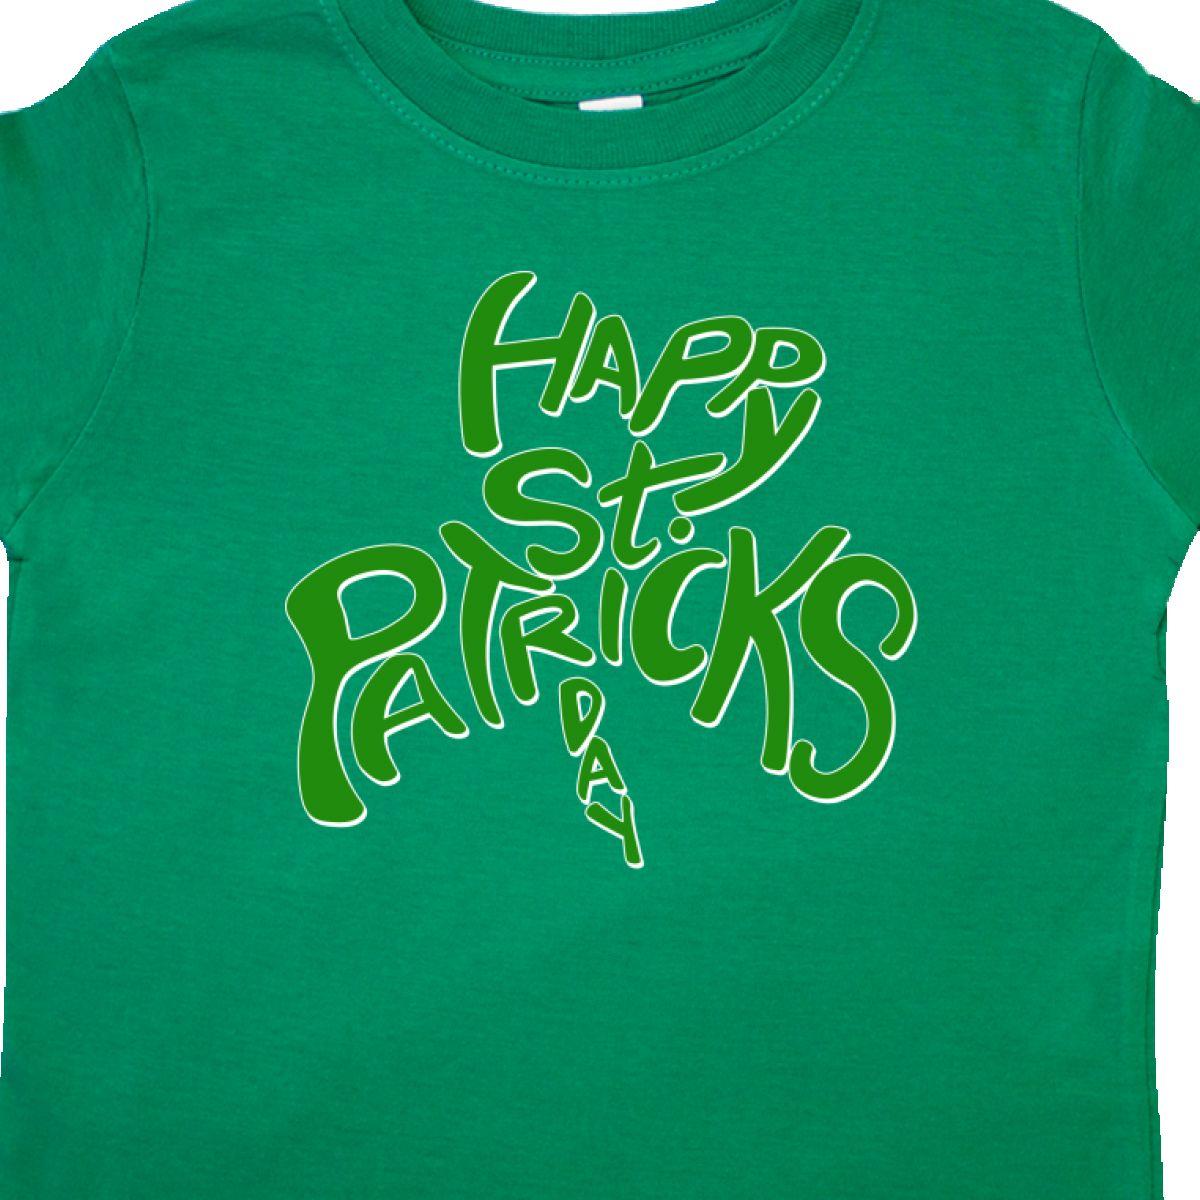 Inktastic-Happy-St-Patrick-039-s-Day-Green-Shamrock-Shape-Toddler-T-Shirt-Patrick thumbnail 4